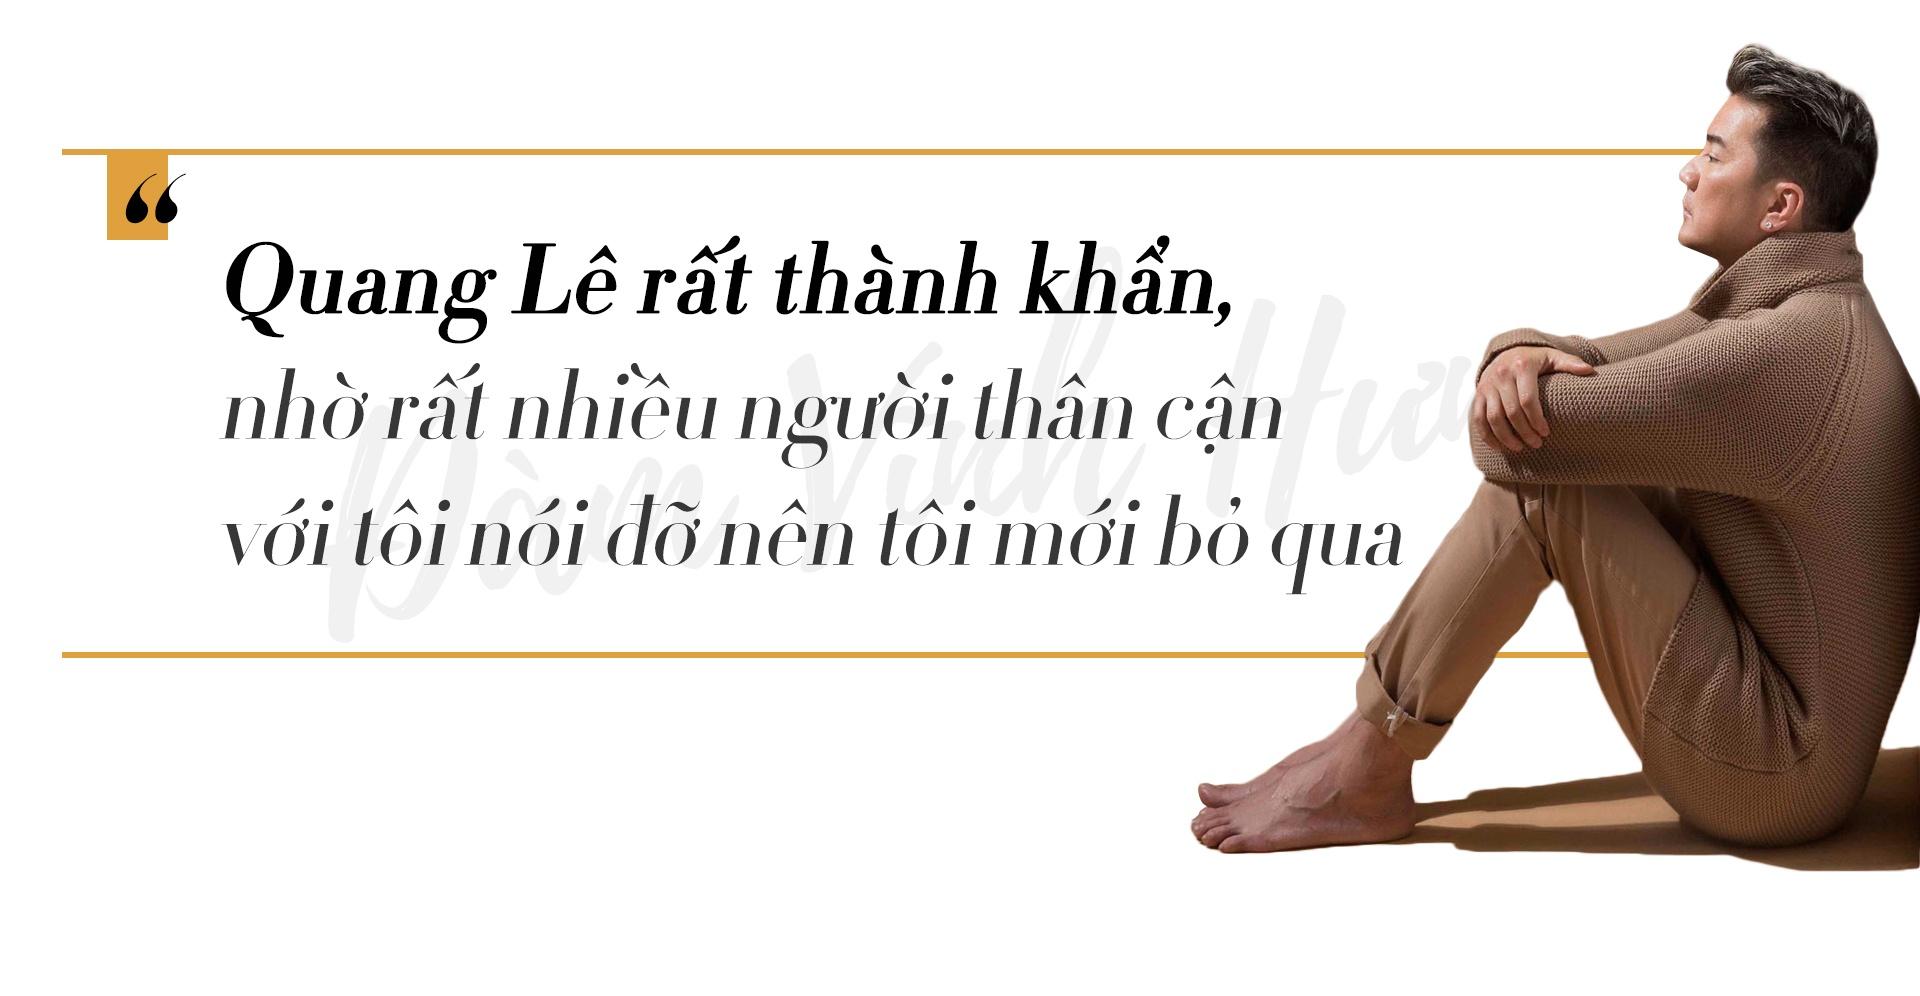 Dam Vinh Hung: 'Quang Le phai nan ni suot 9 thang toi moi bo qua' hinh anh 5